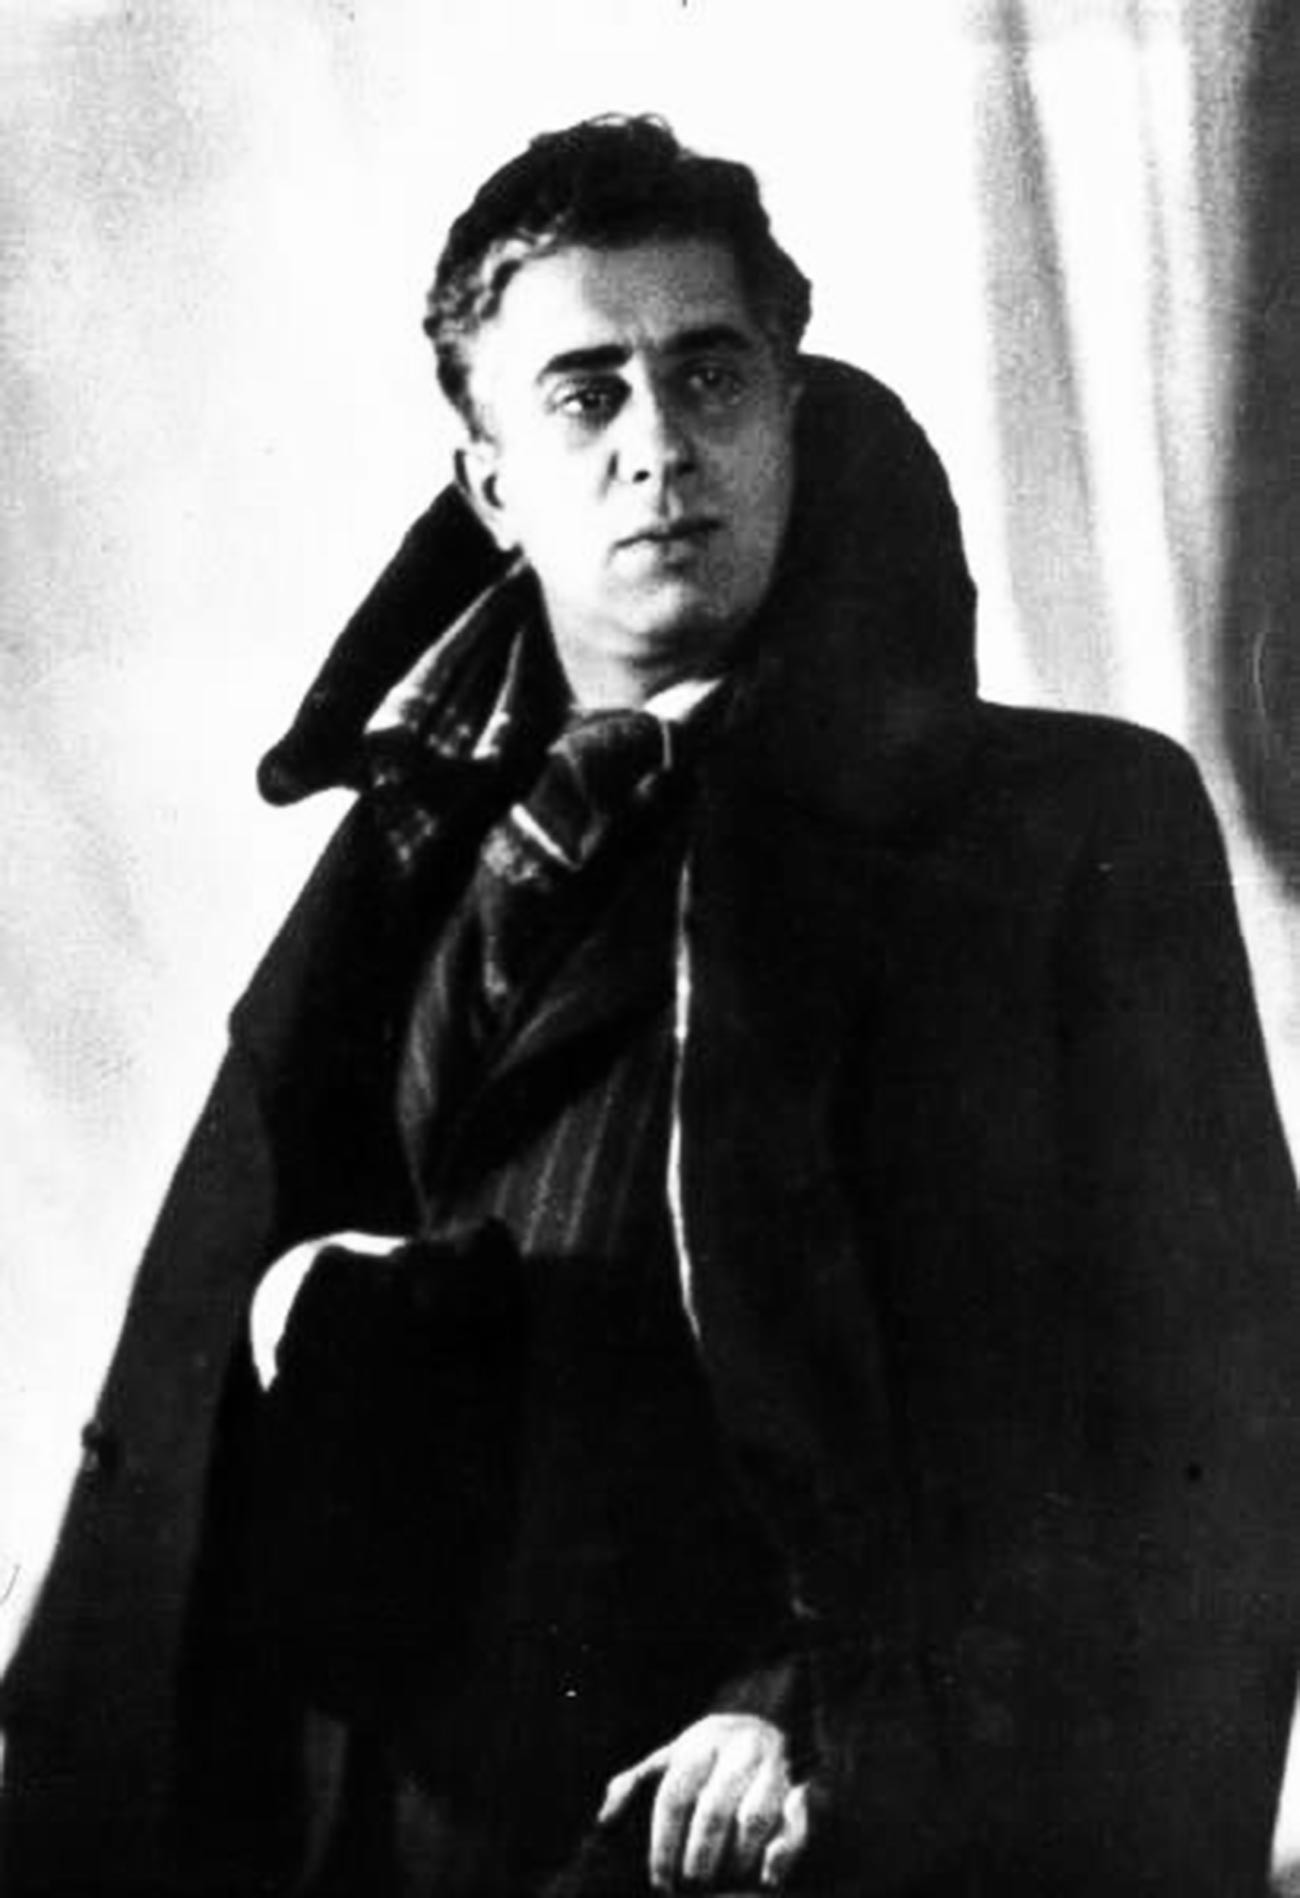 El compositor Aram Jachaturián, 1939